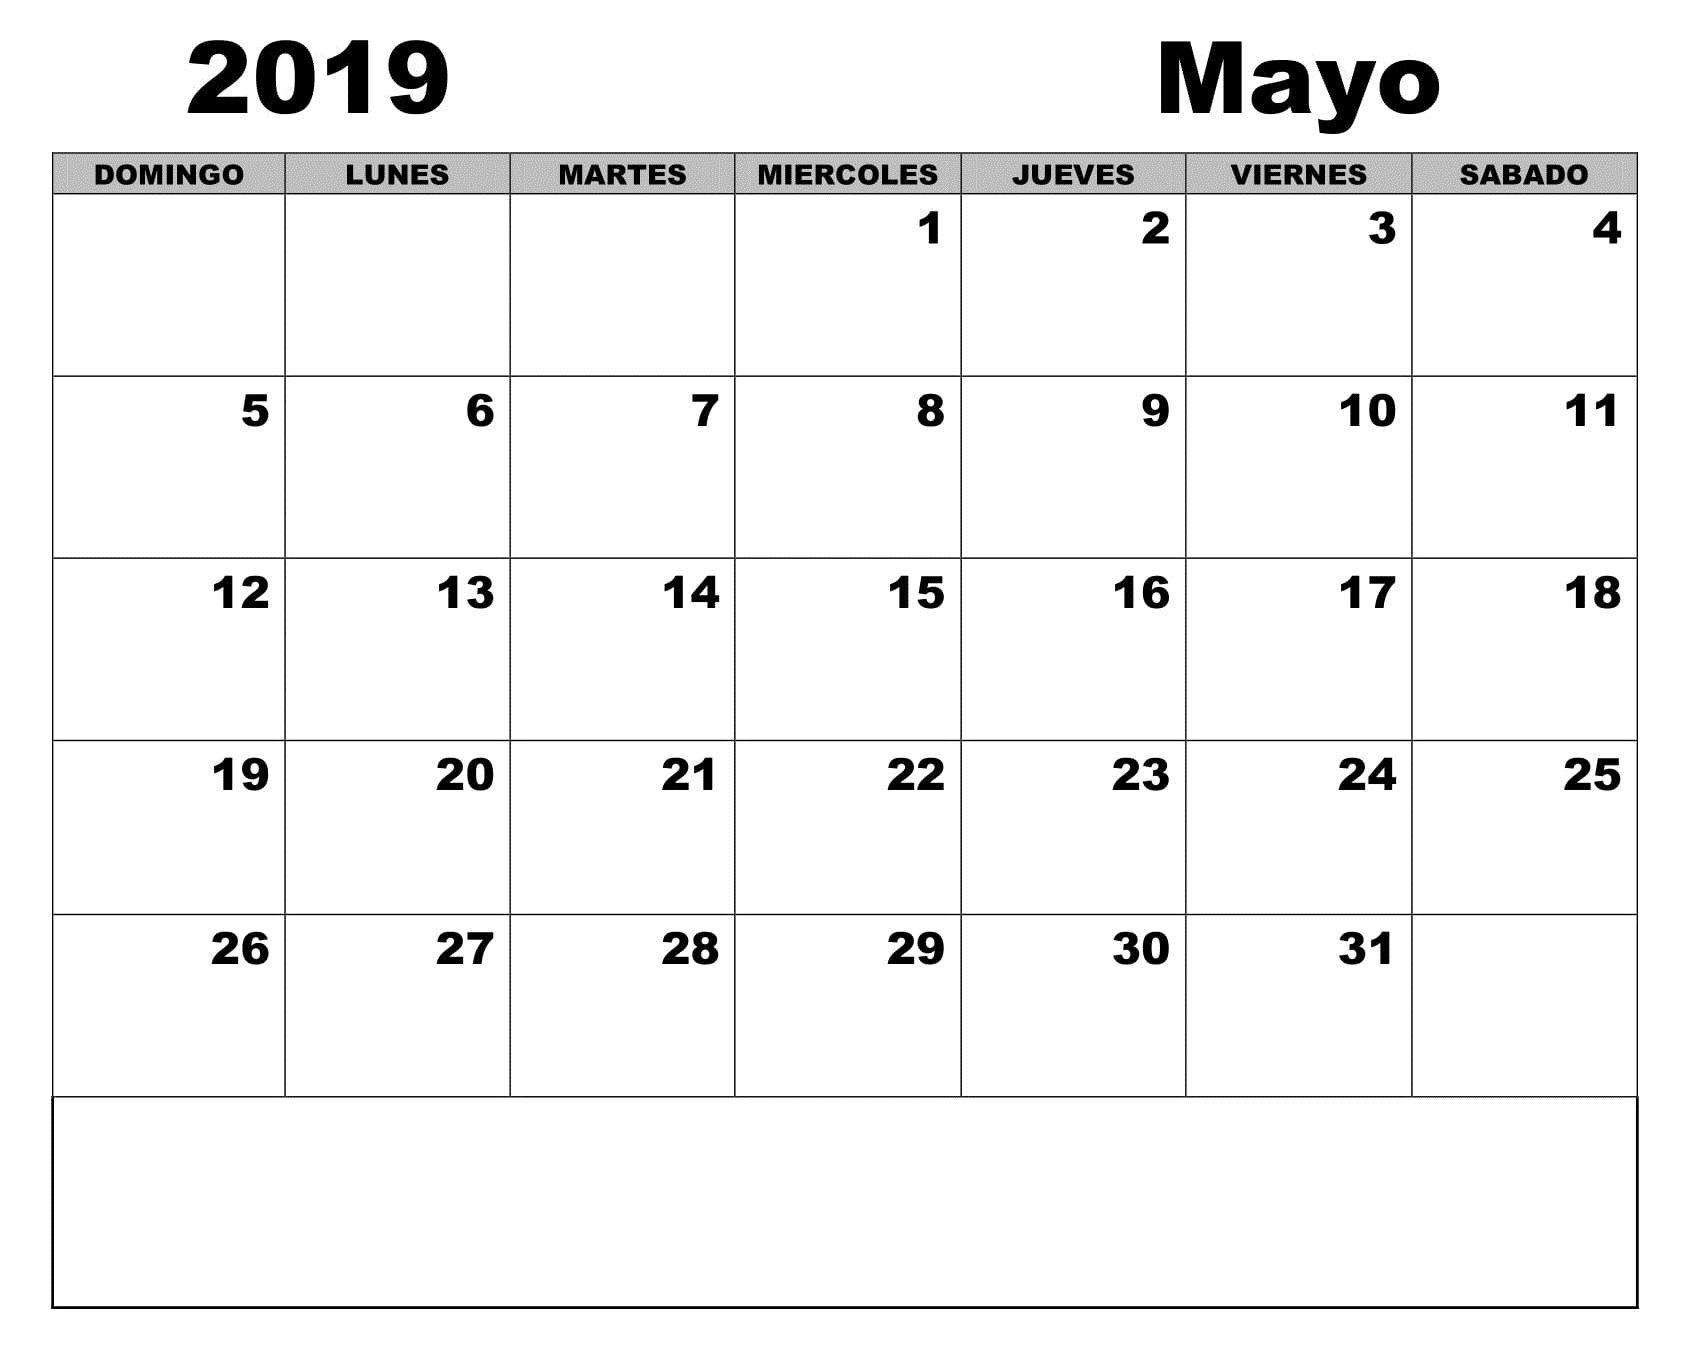 Calendario Word 2019.Calendario 2019 Para Imprimir Blanco Mayo 200 May 2019 Printable